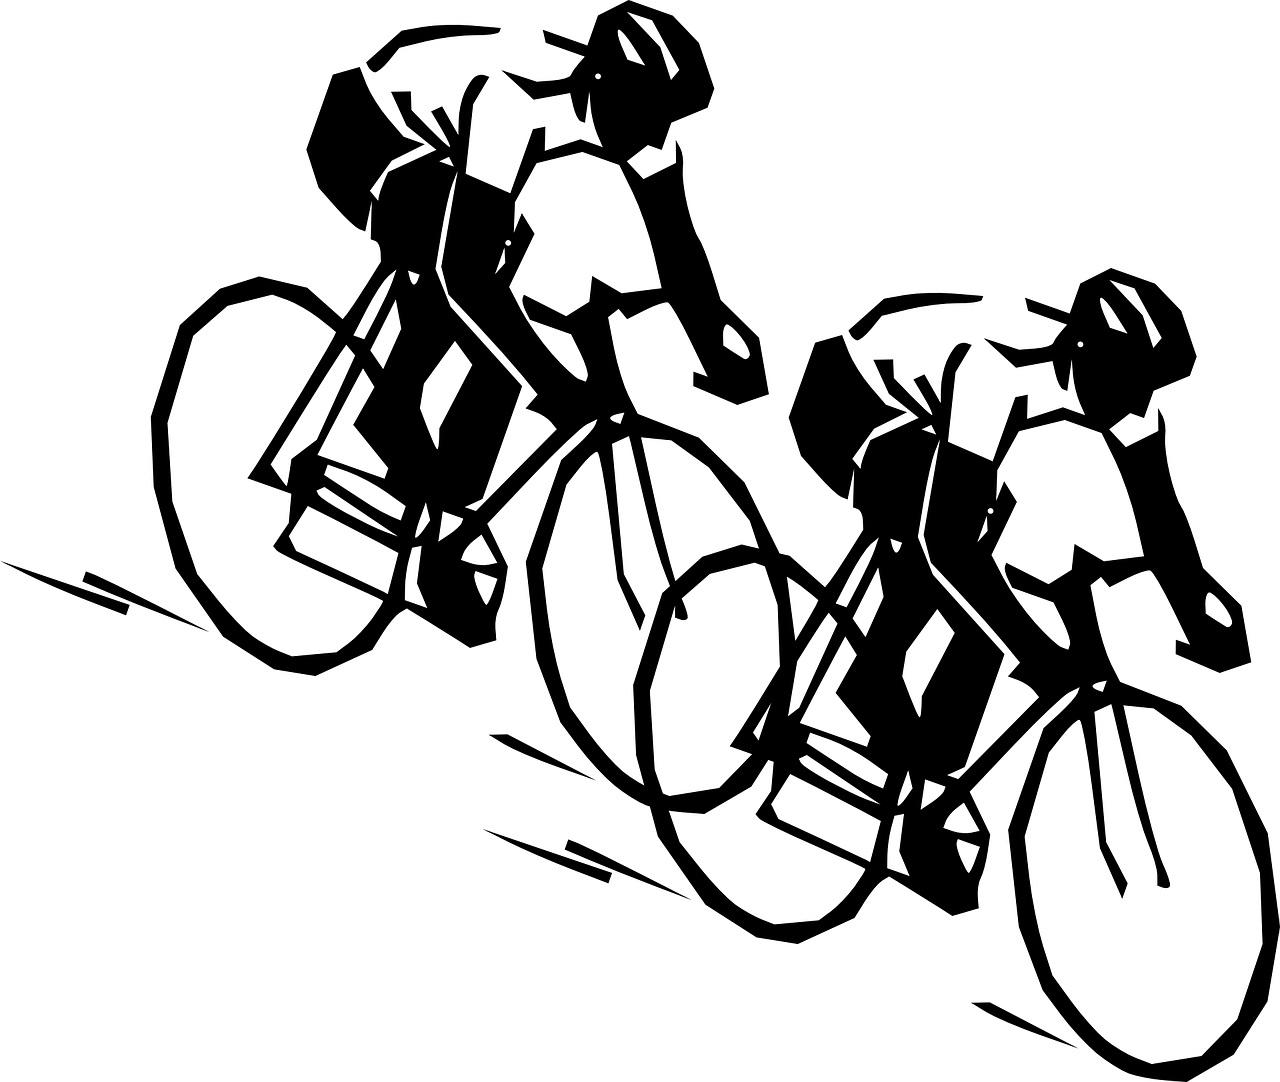 Primoz Roglic & Tadej Pogacar - Tour de France 2020